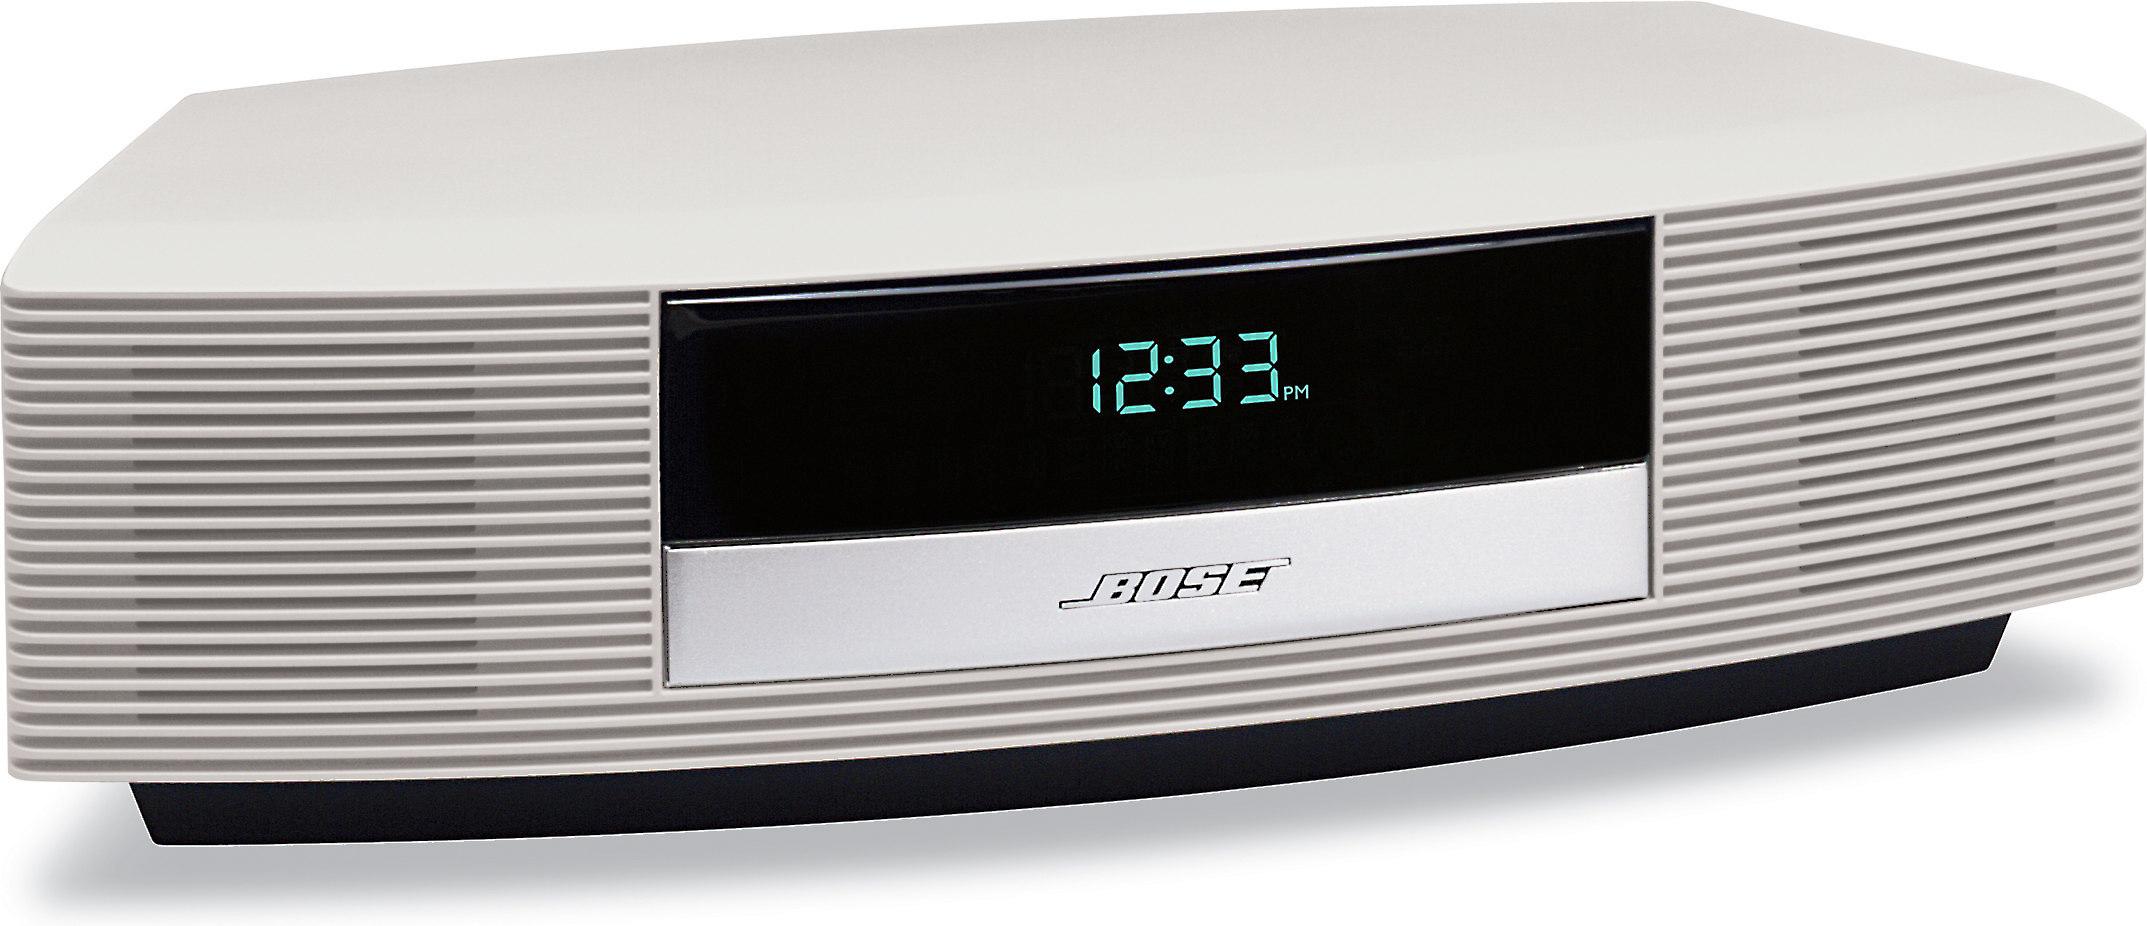 Bose Under Cabinet Radio Cd Player | Cabinets Matttroy